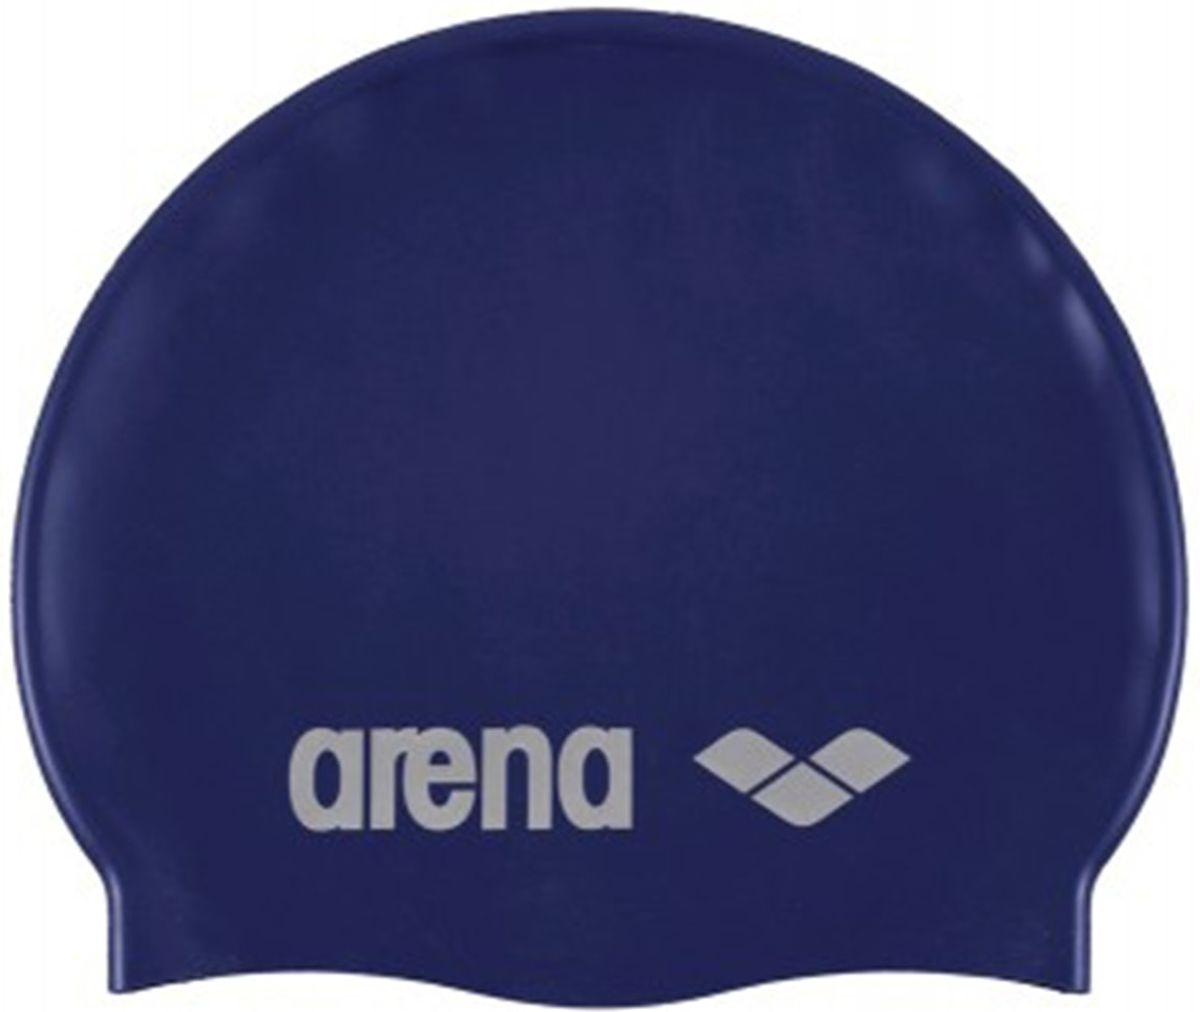 Шапочка для плавания Arena Classic Silicone Cap, цвет: темно-синий икона янтарная богородица скоропослушница кян 2 305